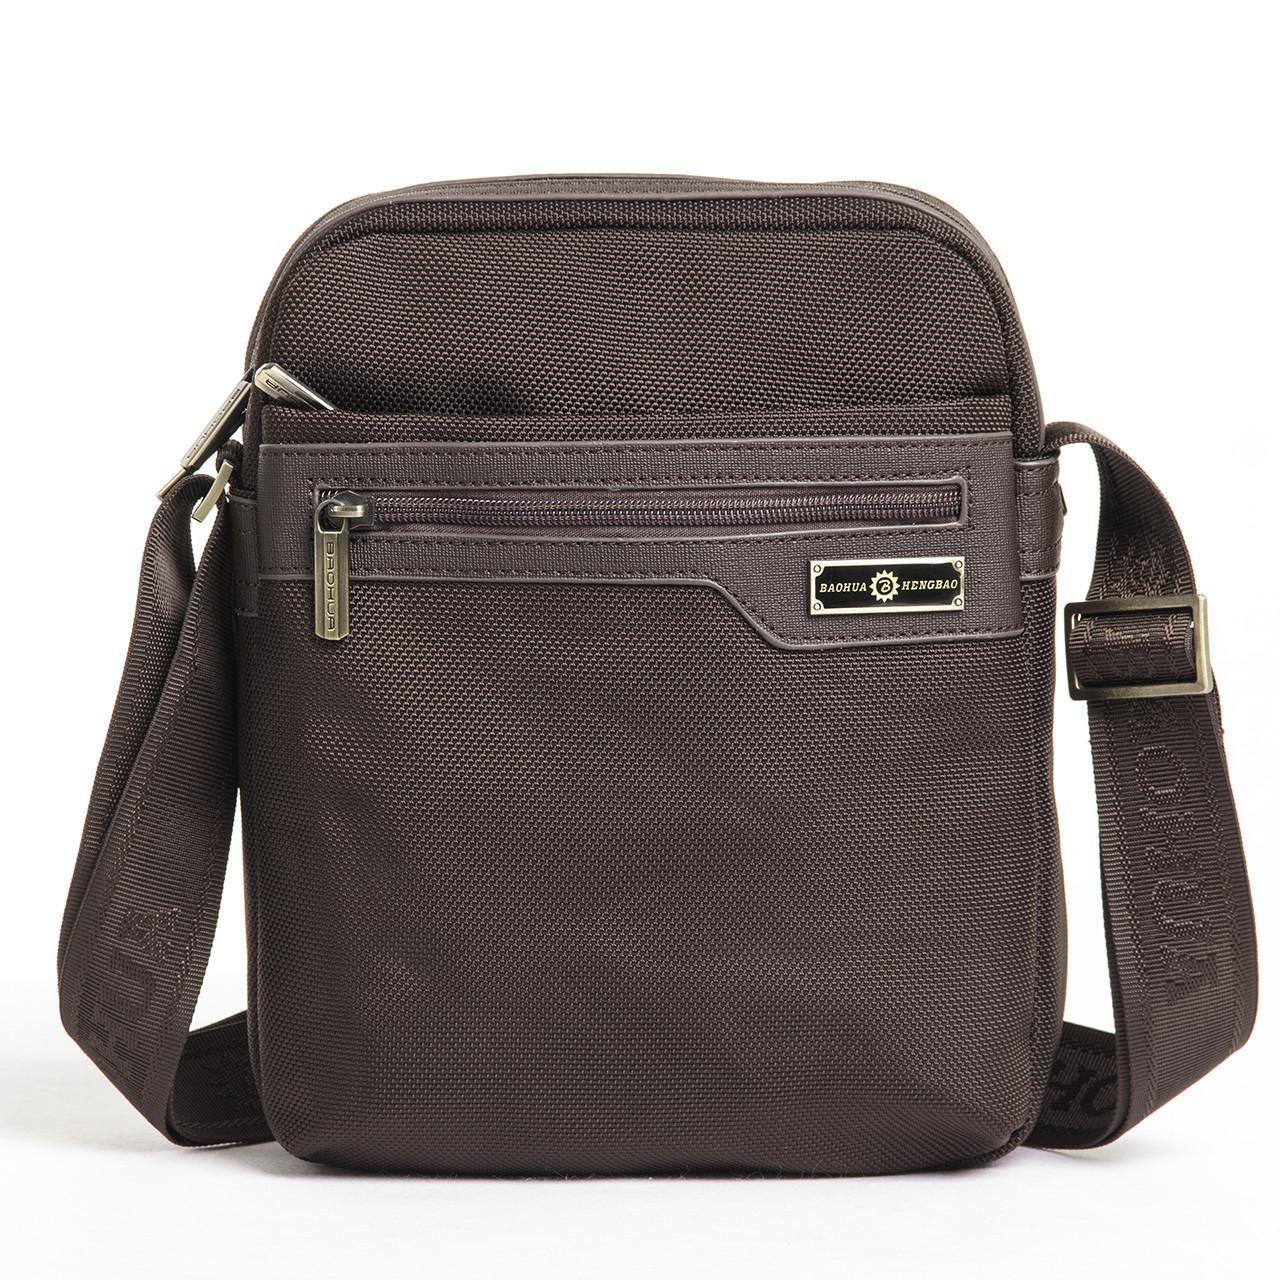 Мужская сумка BAOHUA 21х26х8 вертикальная, ткань Оксфорд ксВН8159-8,75к